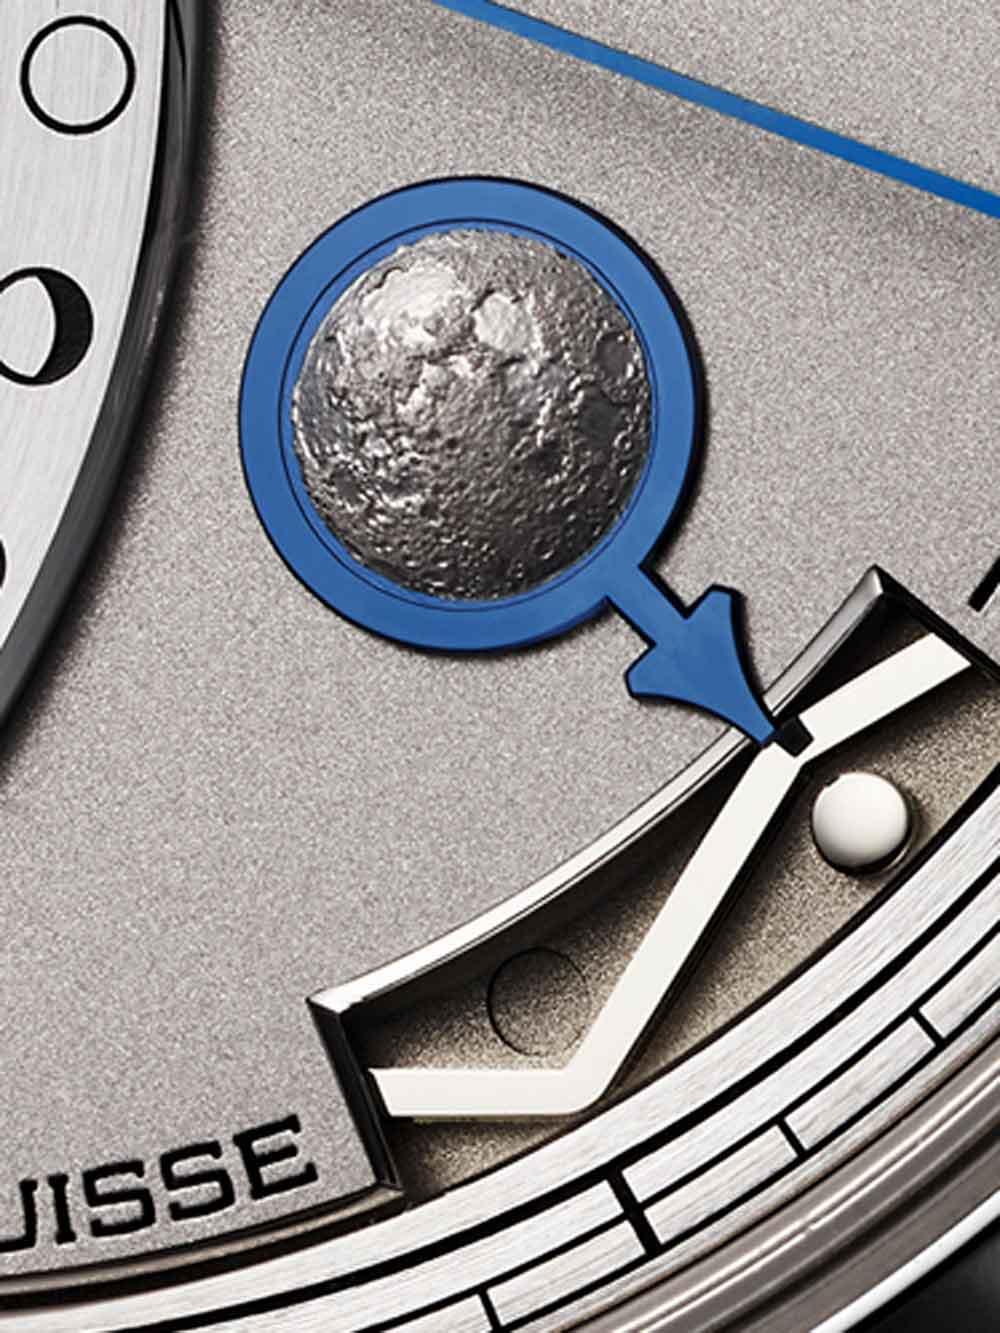 Indicador patentado fases de la luna del Reloj Chronomètre FB 1 L de la manufactura relojra suiza La Chronomètrie Ferdinand Berthoud